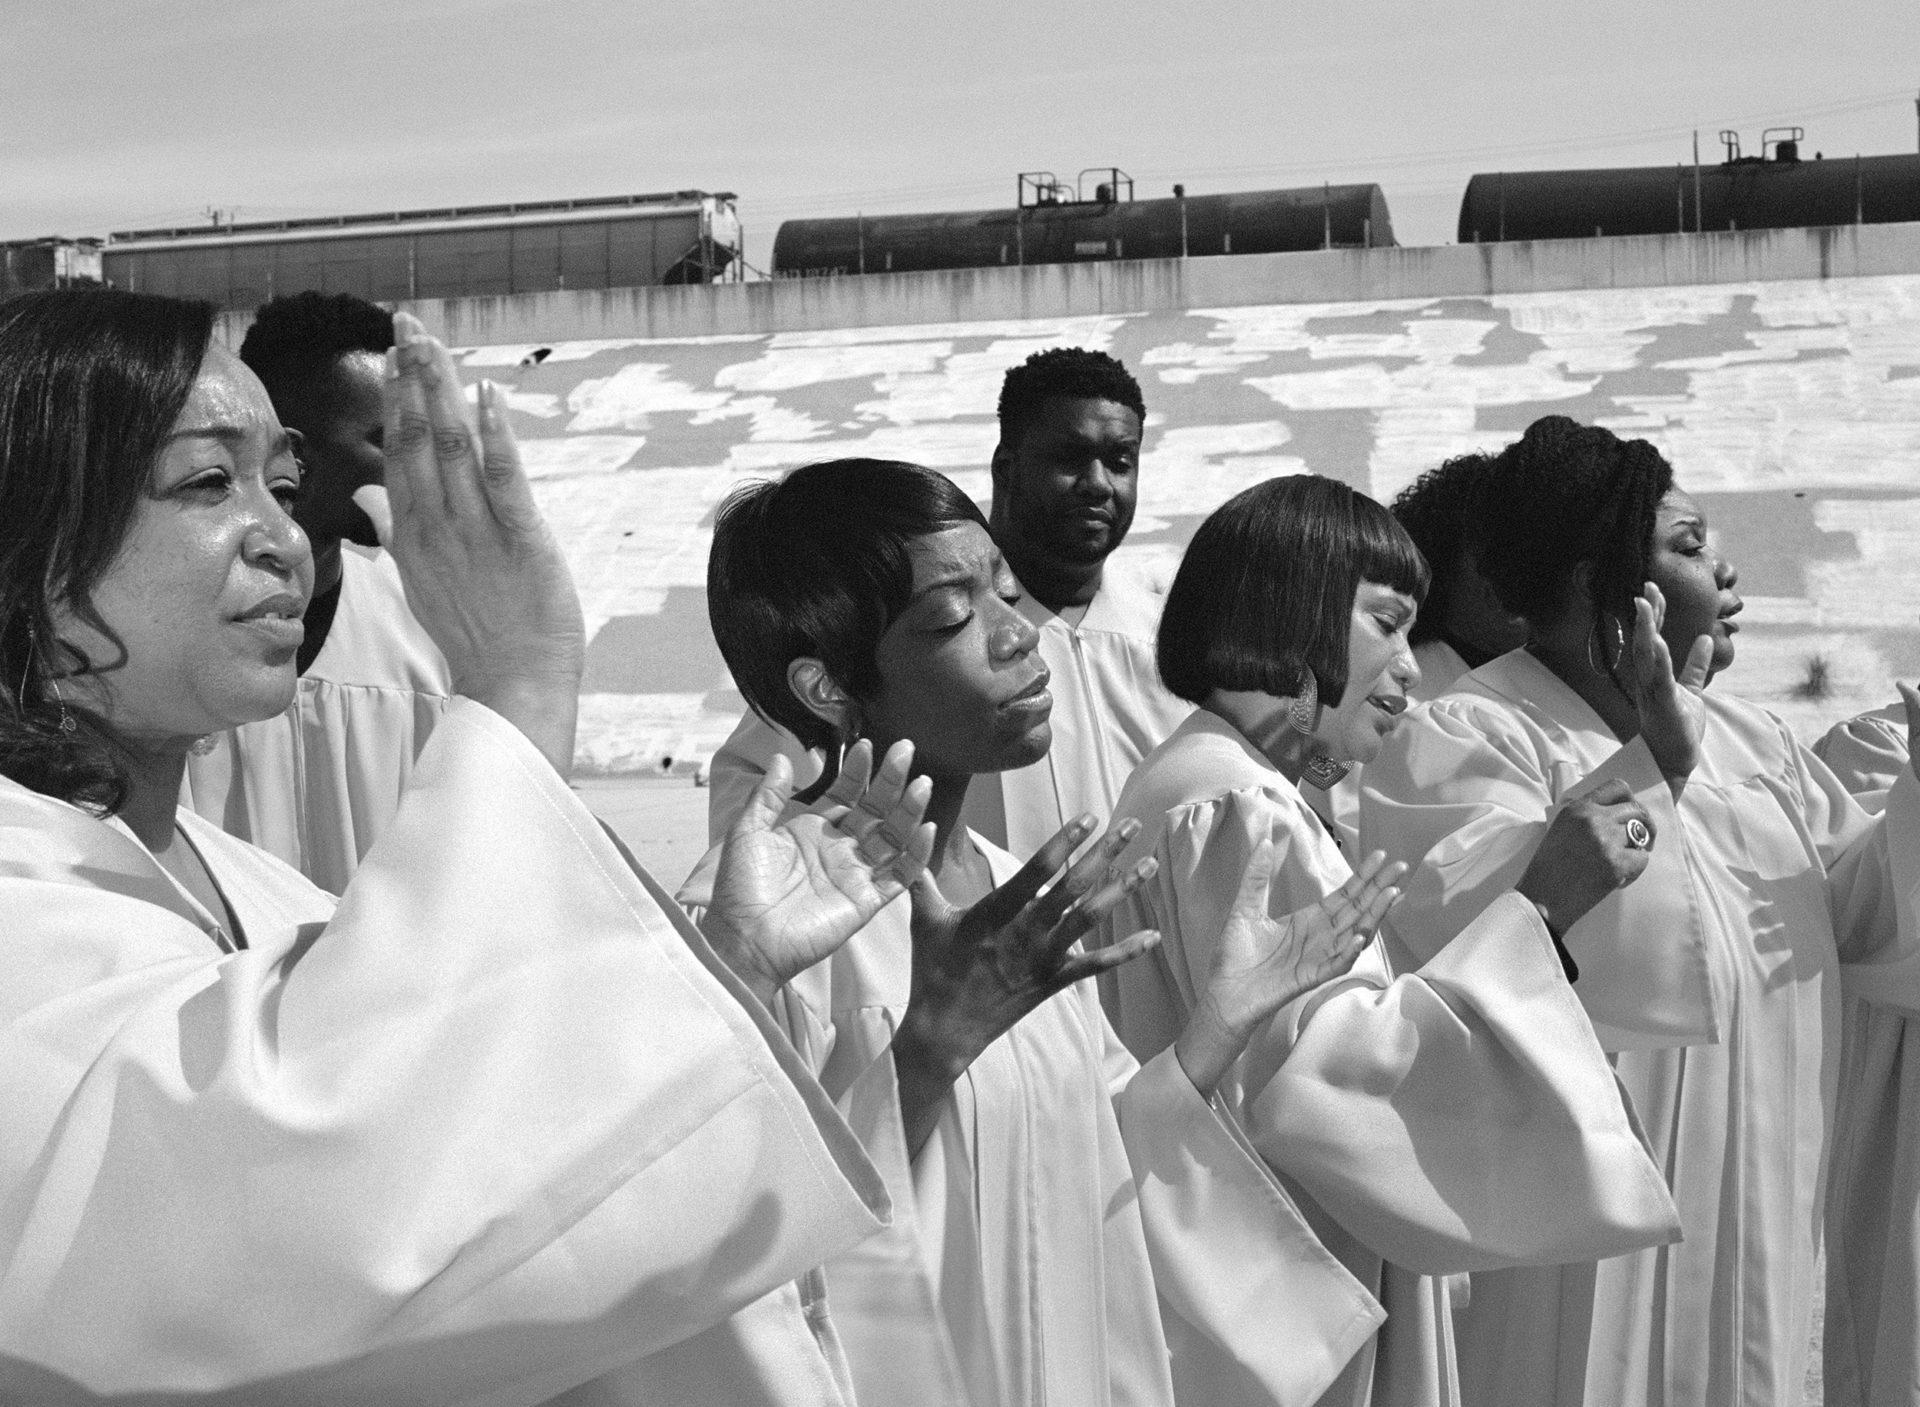 davidblack-cerrogordo-choir-1920x1407